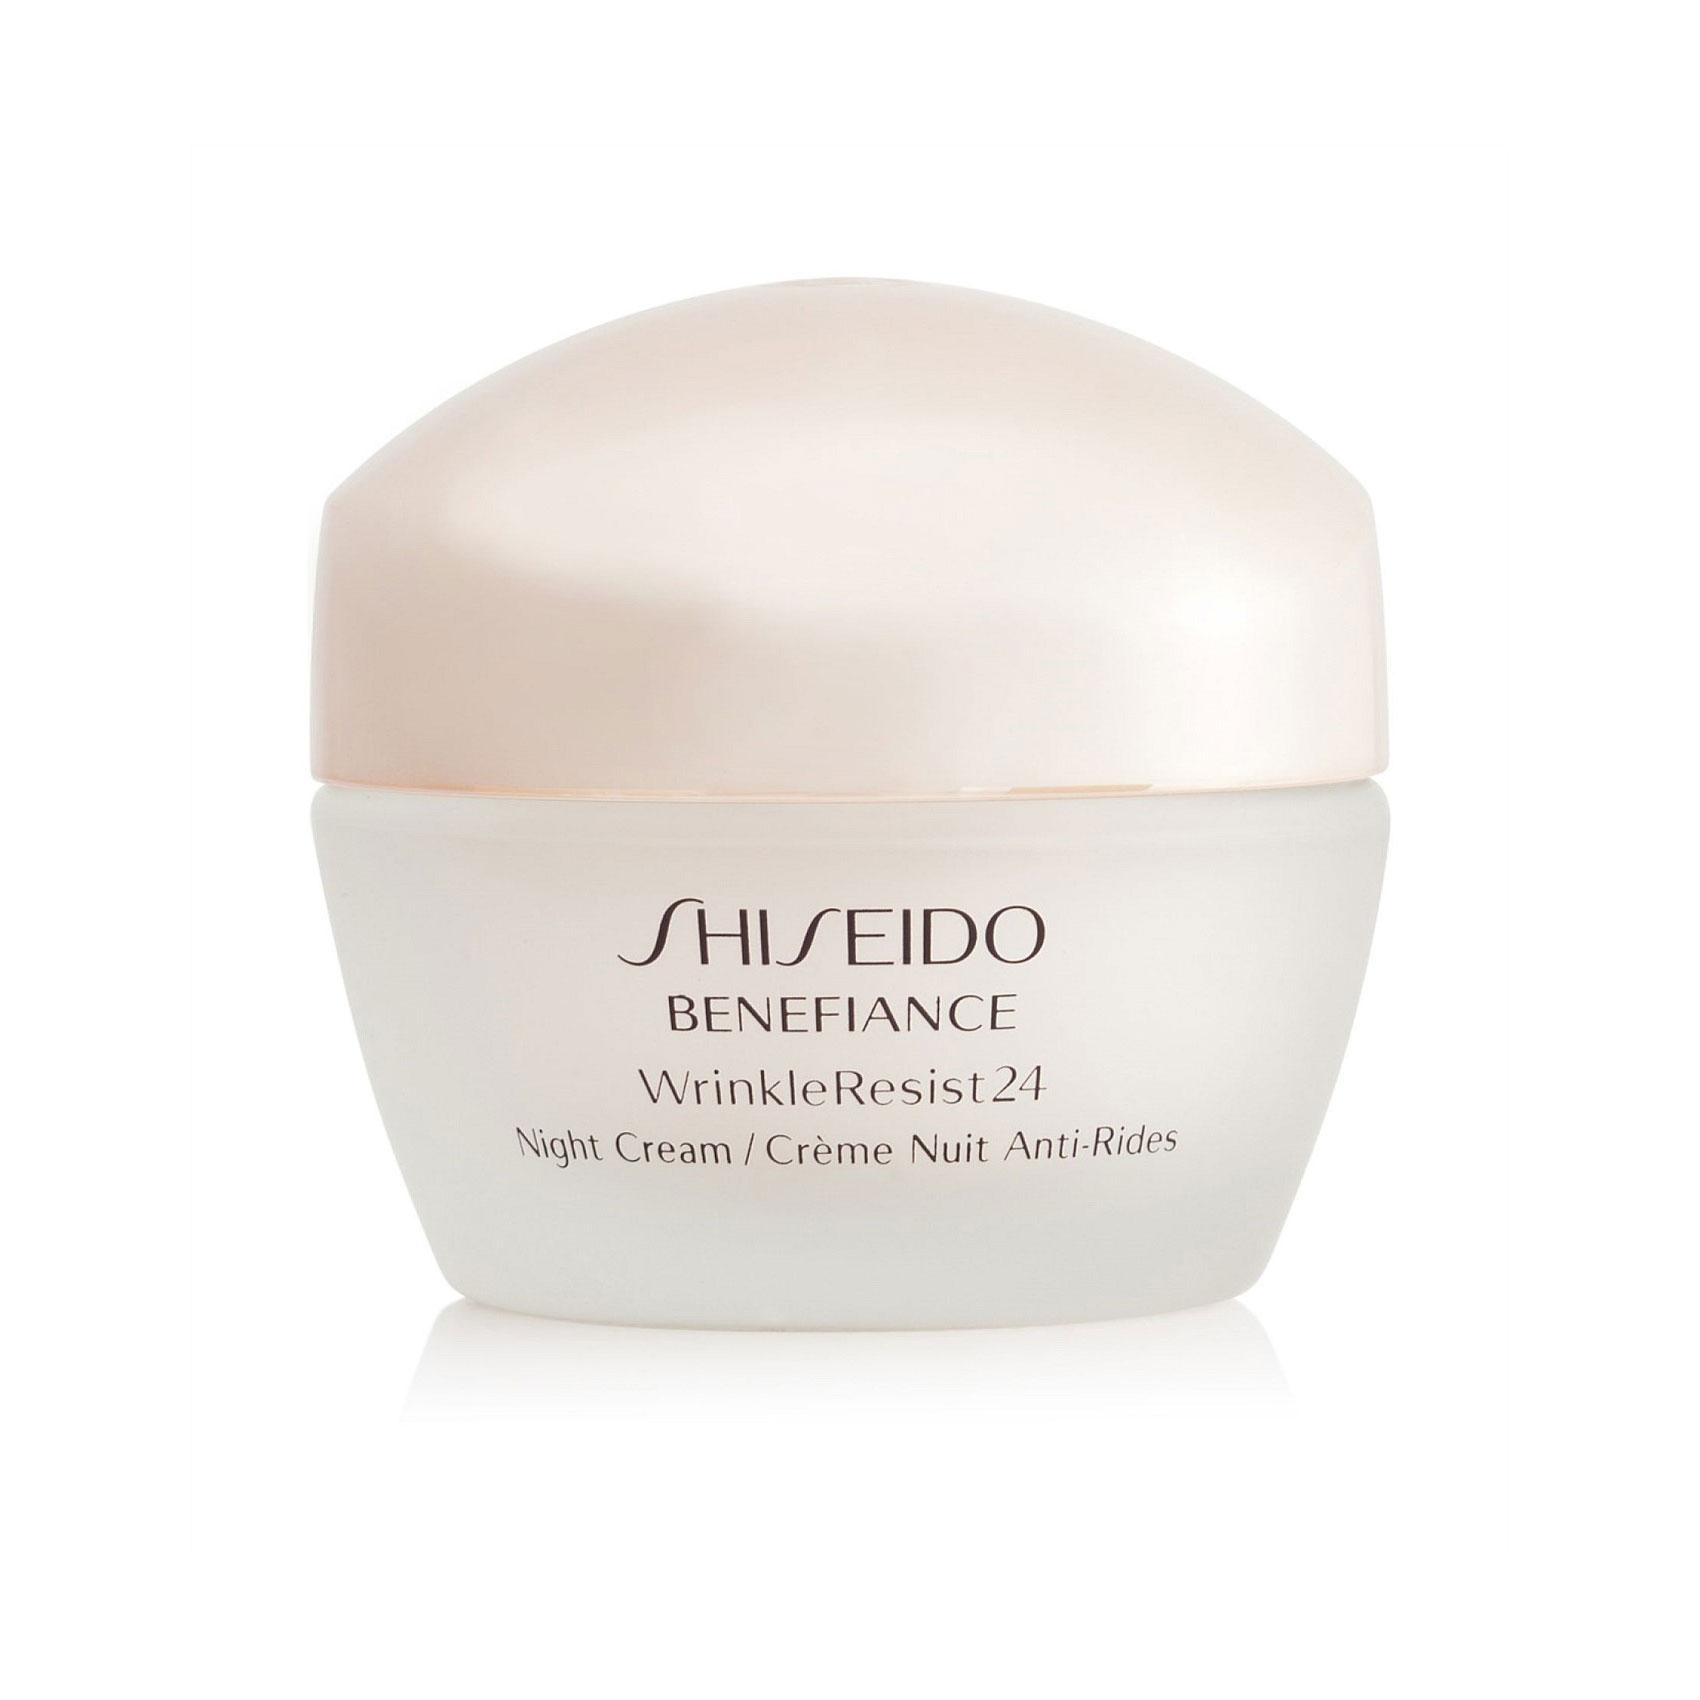 Buy Benefiance Wrinkle Resist 24 Night Cream at Low Price..